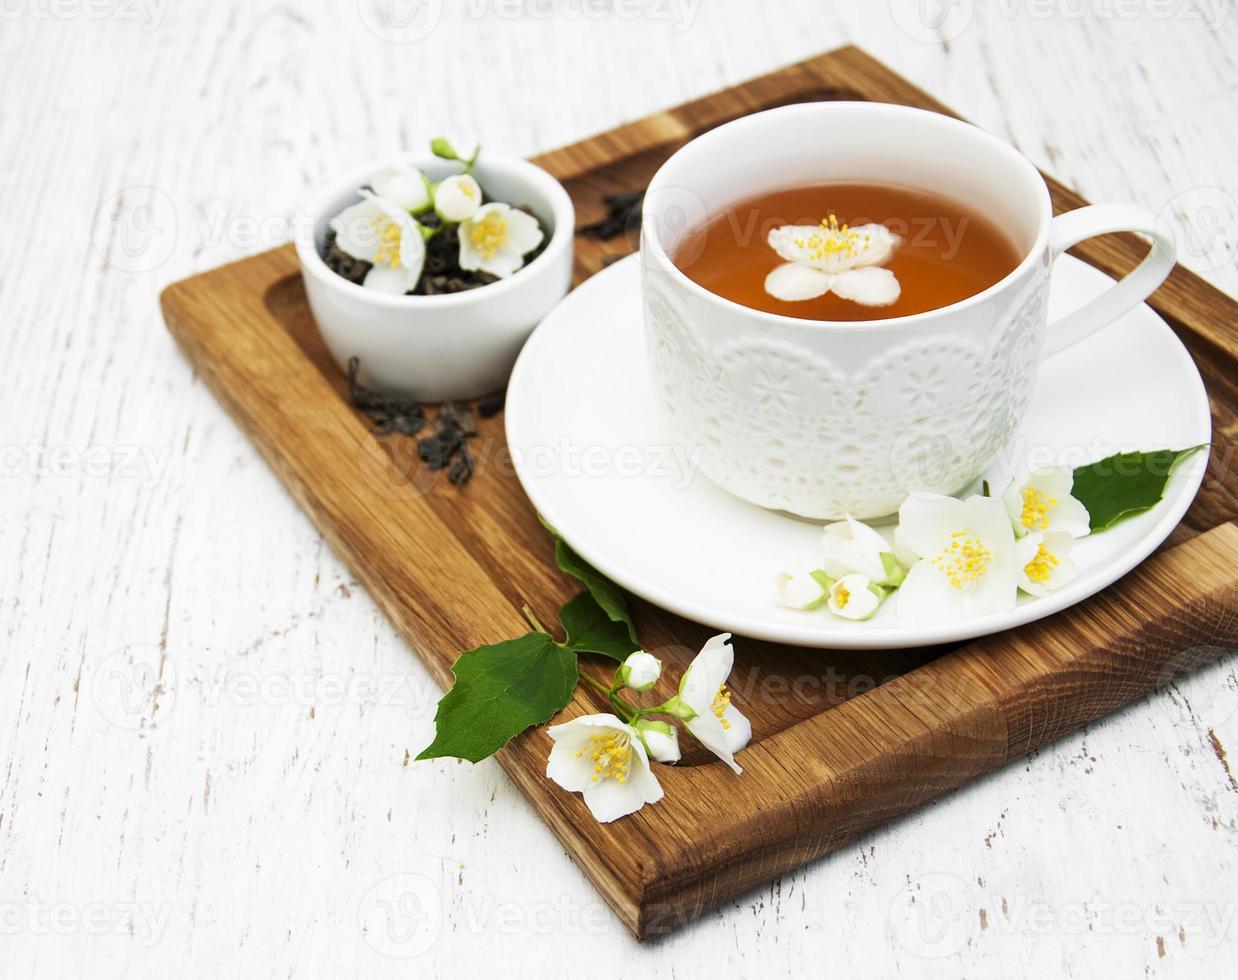 Cup of tea with jasmine flowers photo